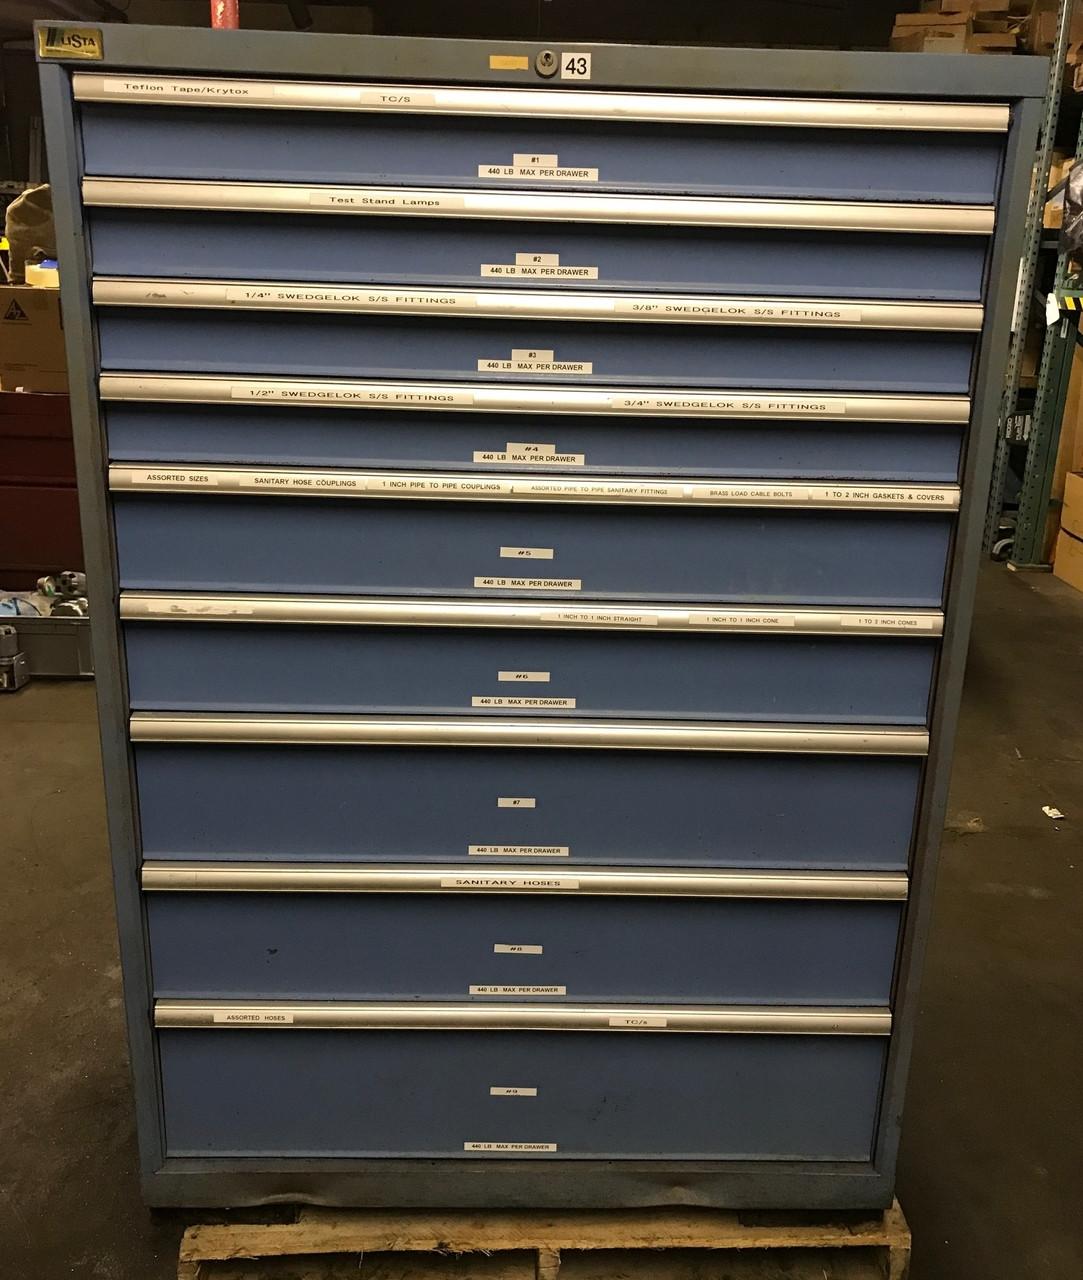 Used Lista 9 Drawer Storage Cabinet 40 1 4 Wide X 22 1 2 Deep X 59 1 2 High